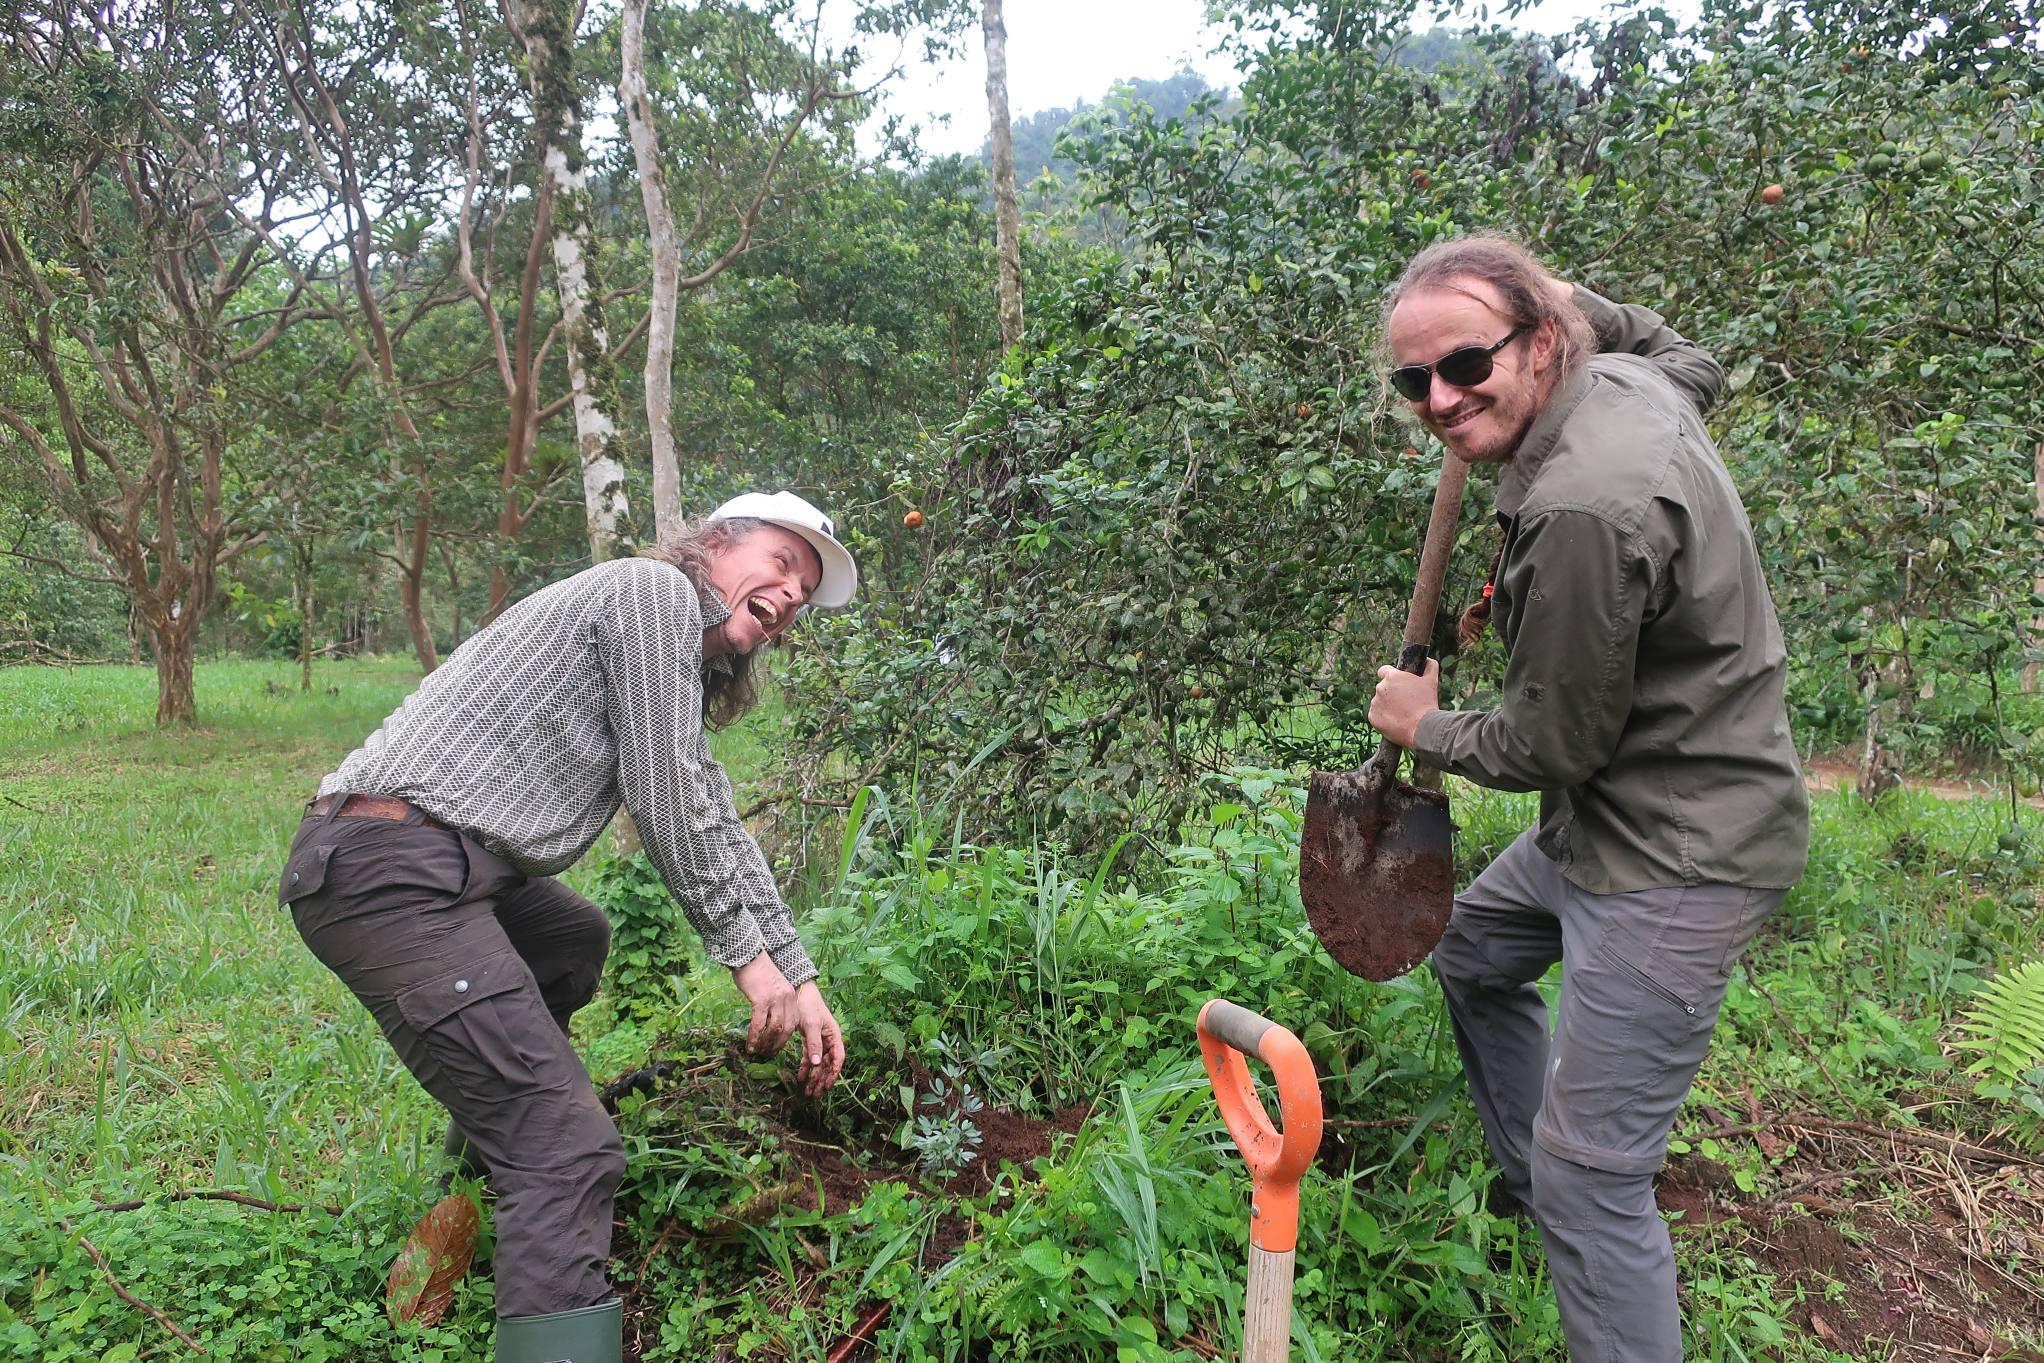 Replanting biodiversity ayahuasca